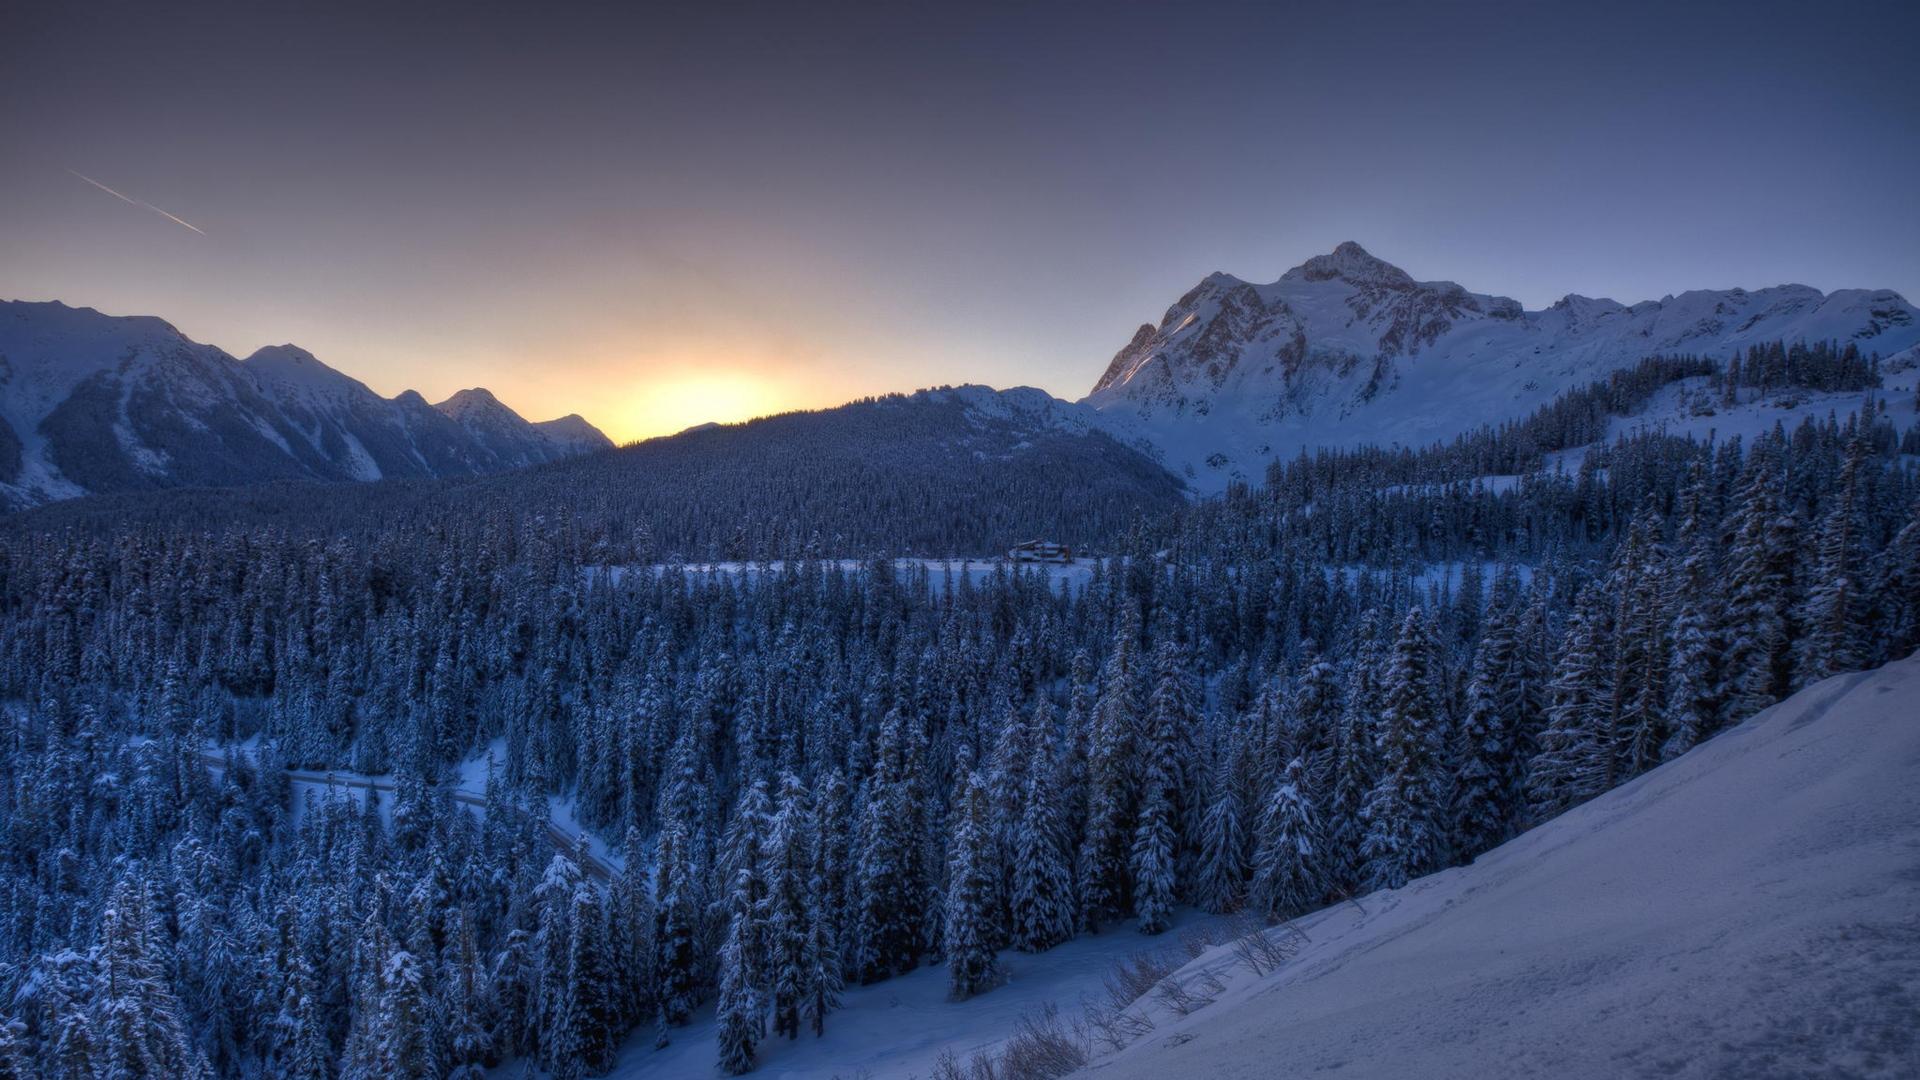 mountains-winter-snow.jpg